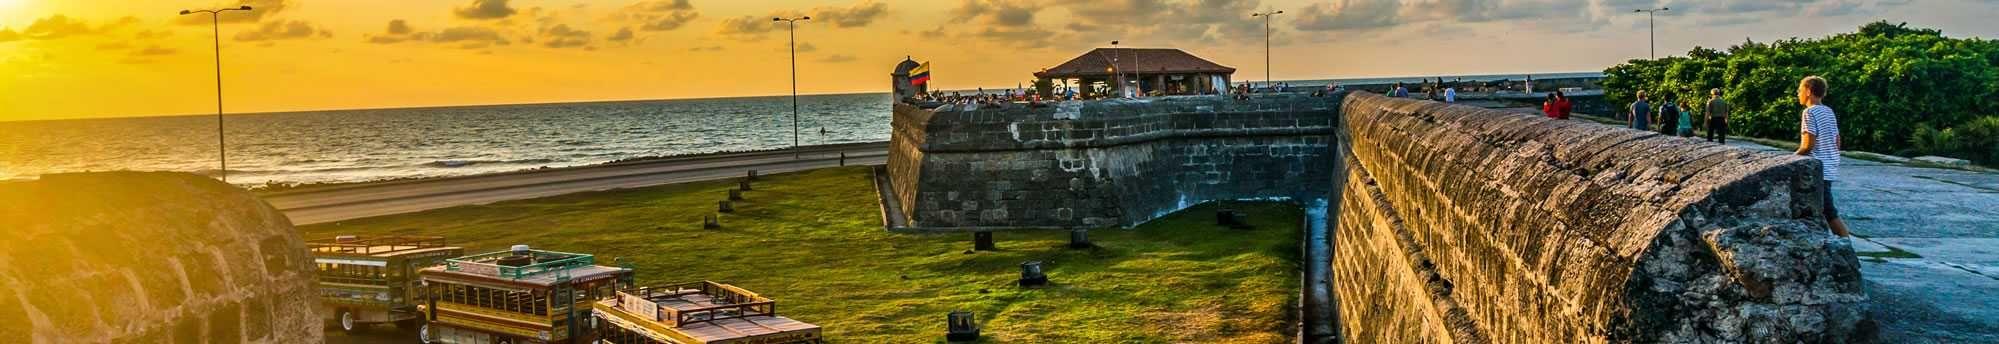 Muralla Púnica de Cartagena